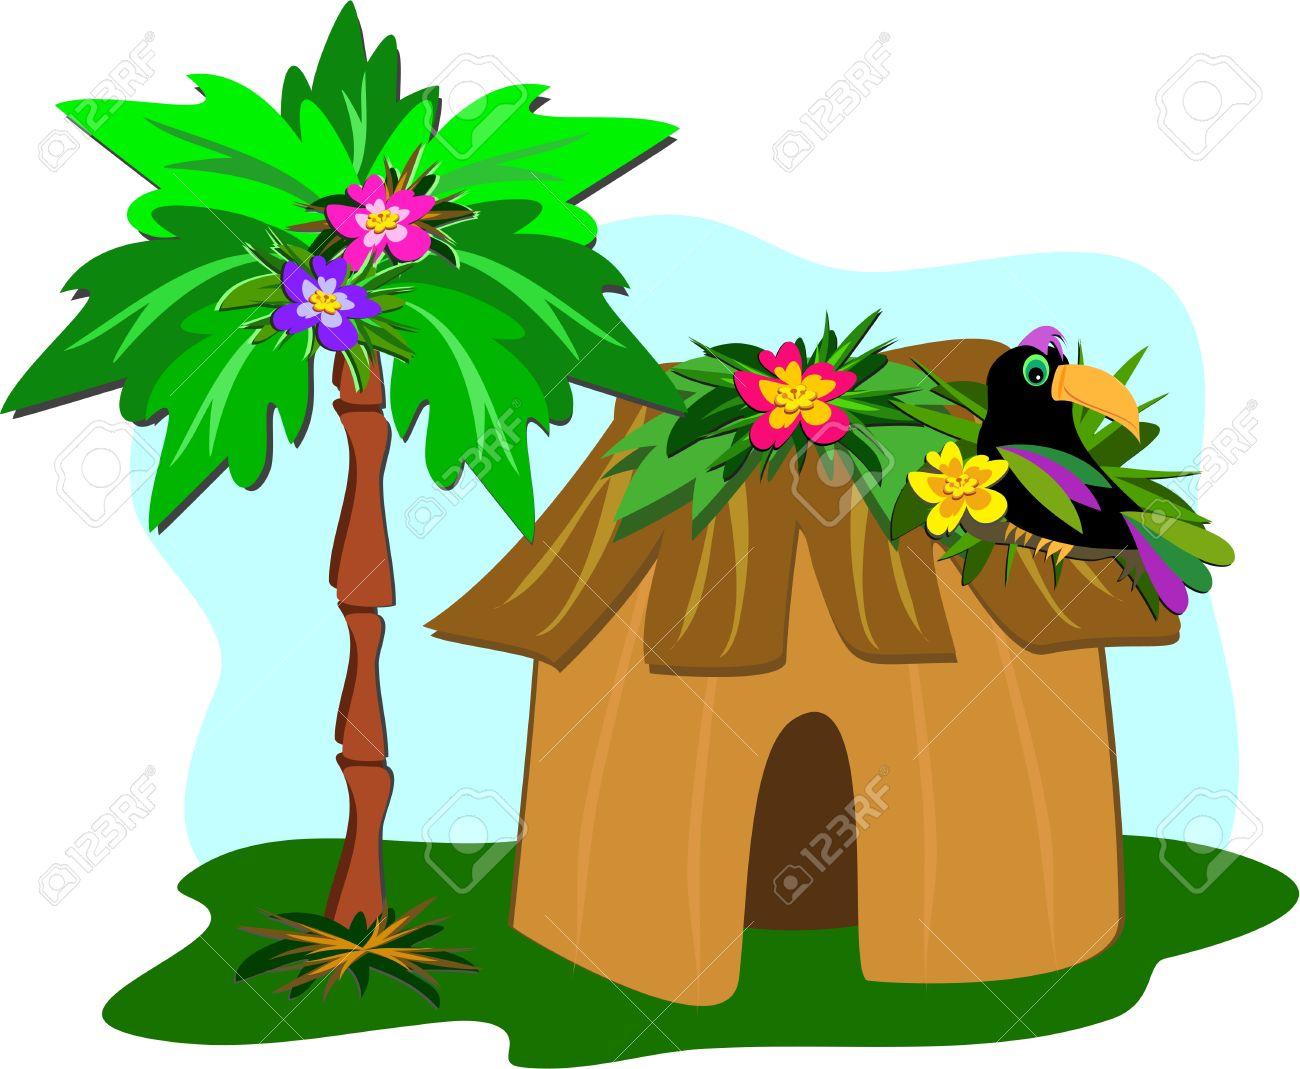 Shack clipart grass hut Clipart Hut Download Clipart Hut